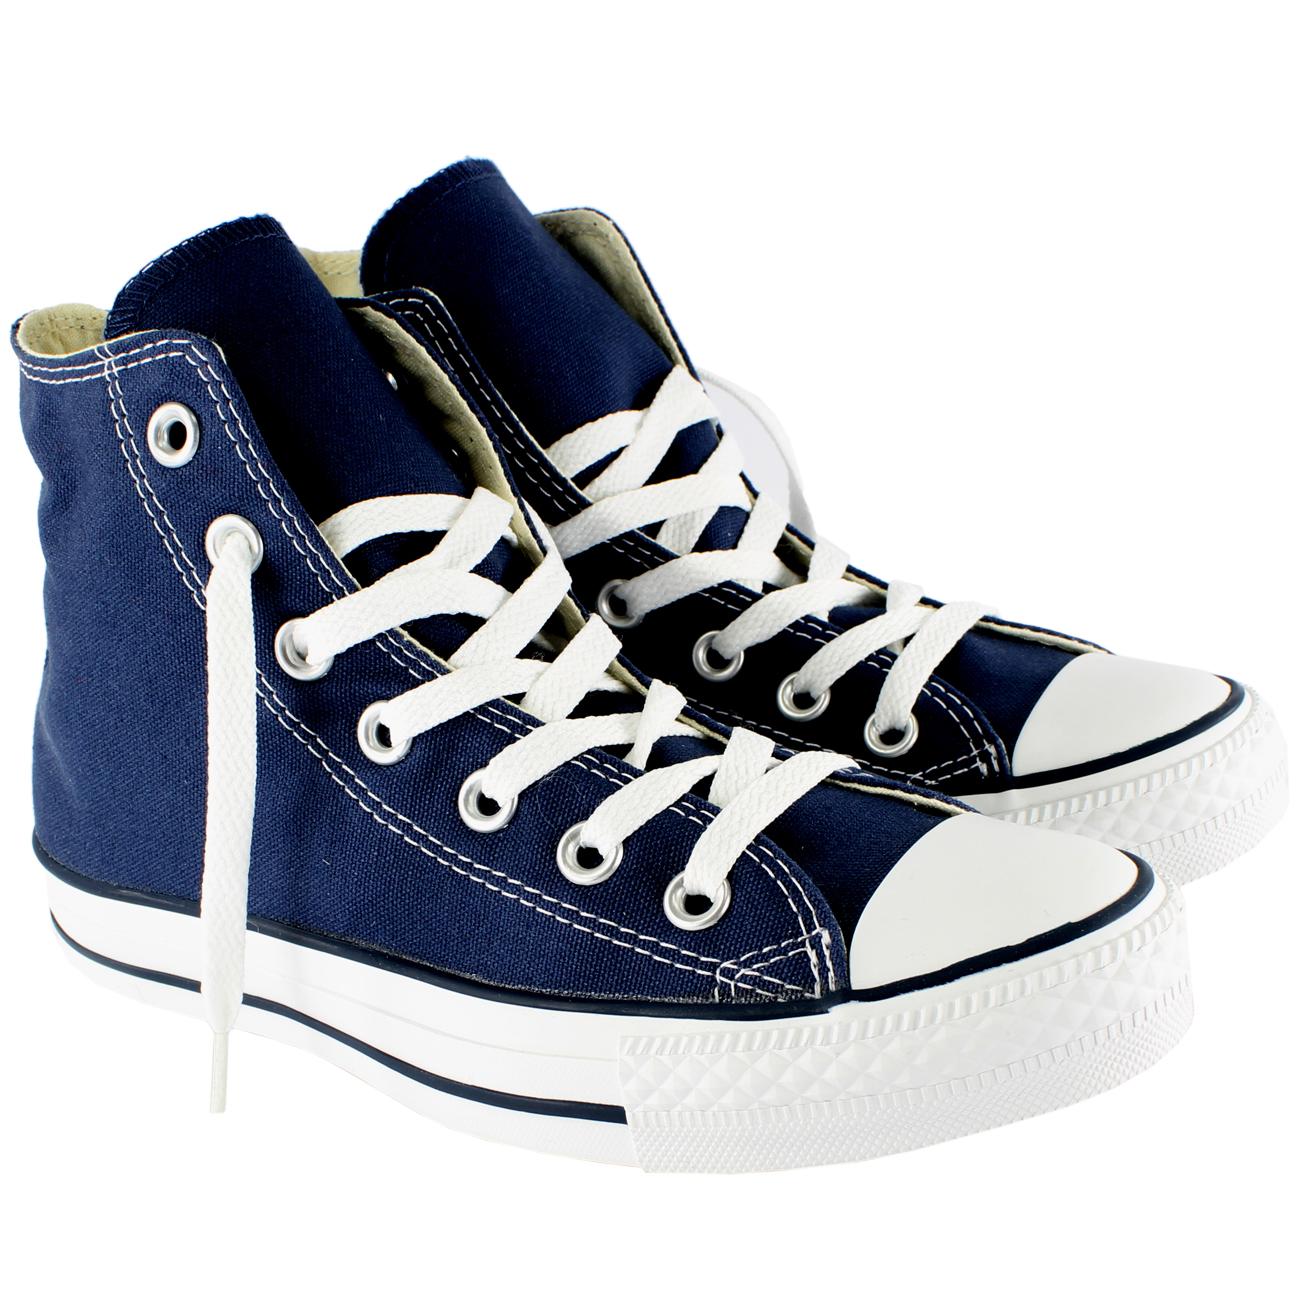 mens blue converse high tops - sochim.com b914a10ad7d8